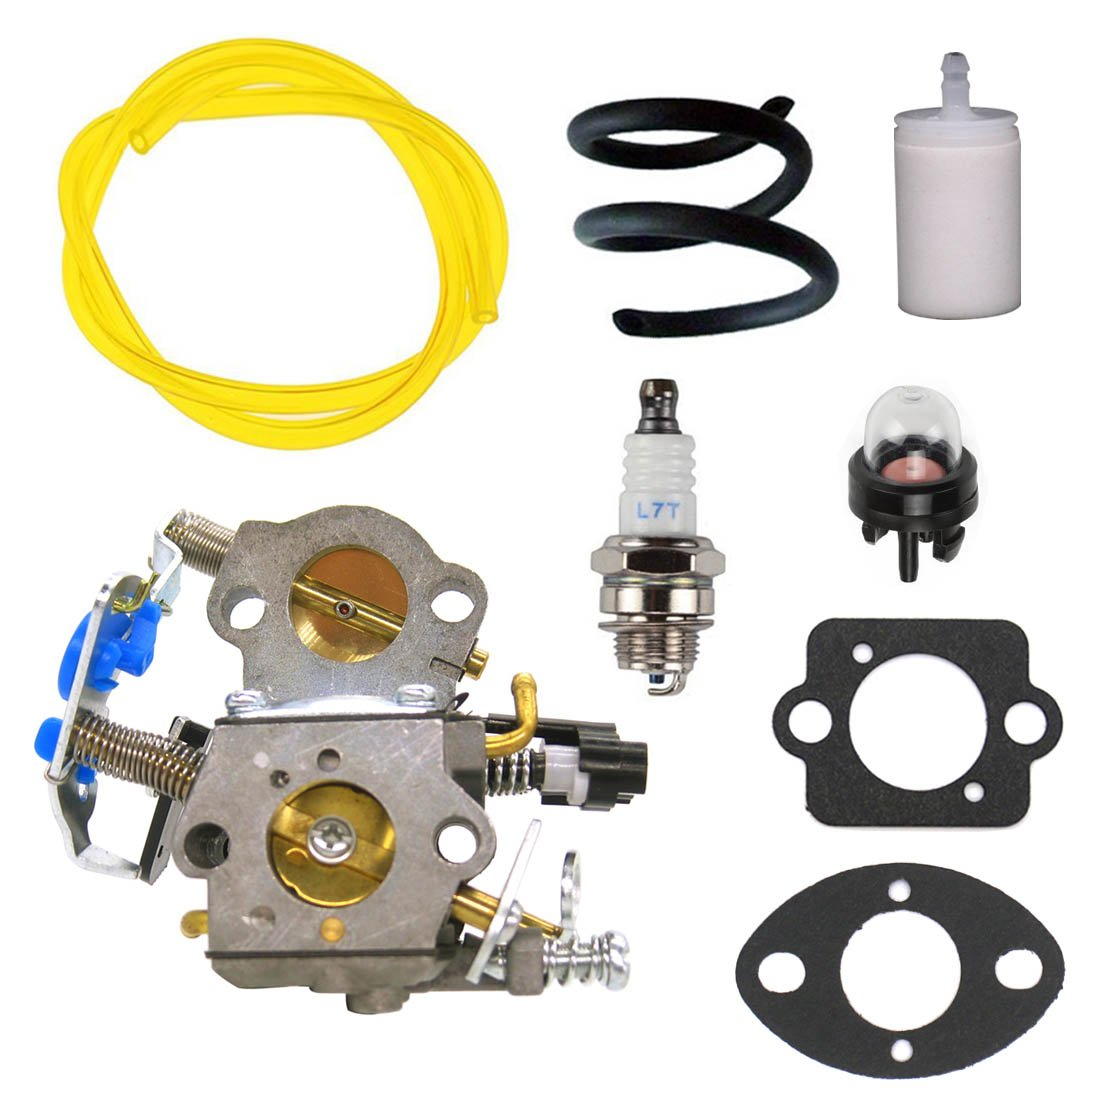 Carburetor For Husqvarna 455 455E 460 461 Chainsaws 544883001 544227401